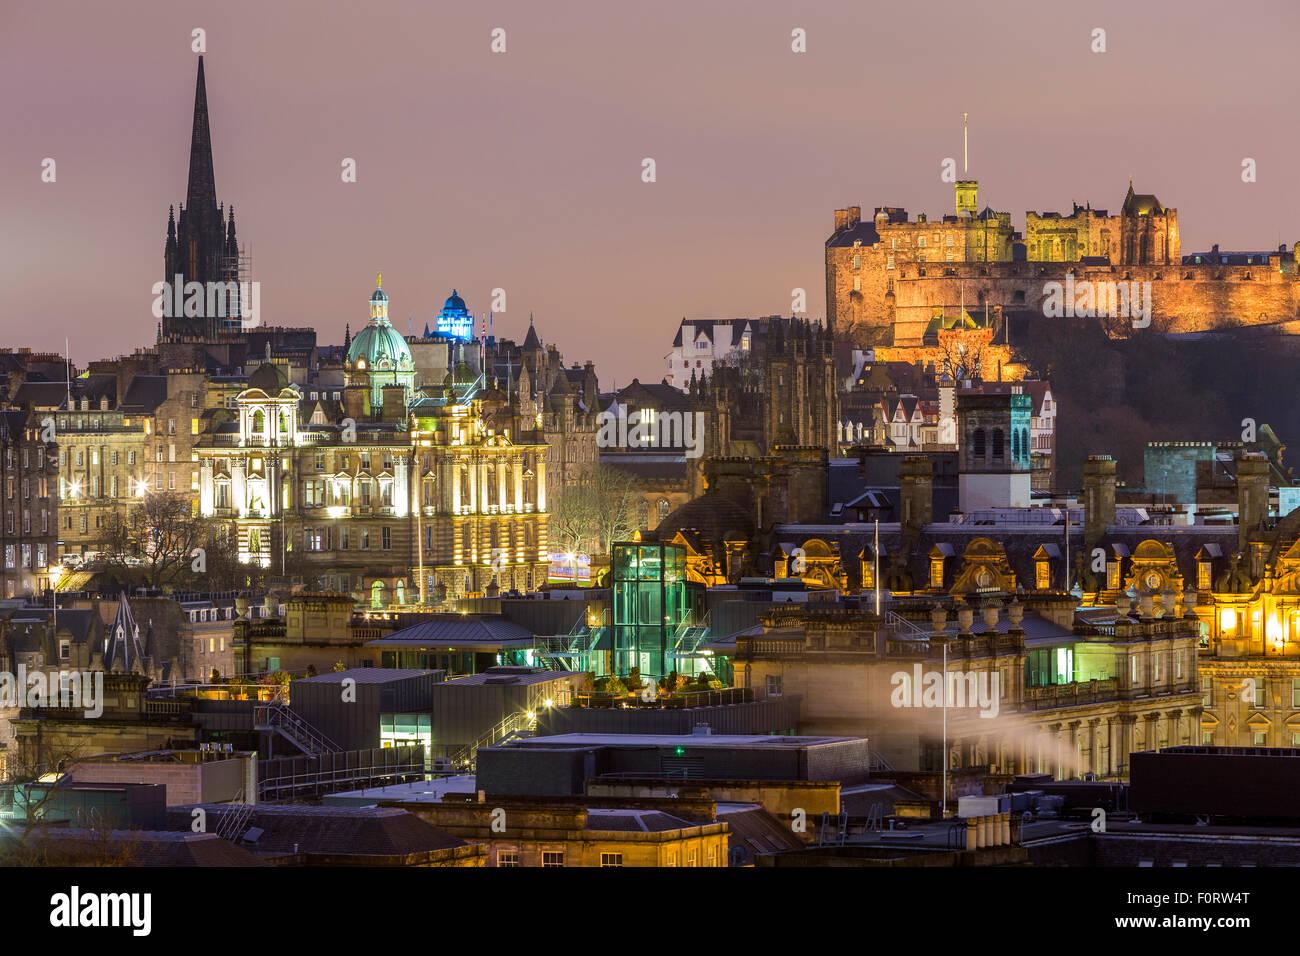 A view from Calton Hill over Edinburgh, City of Edinburgh, Scotland, United Kingdom, Europe. - Stock Image